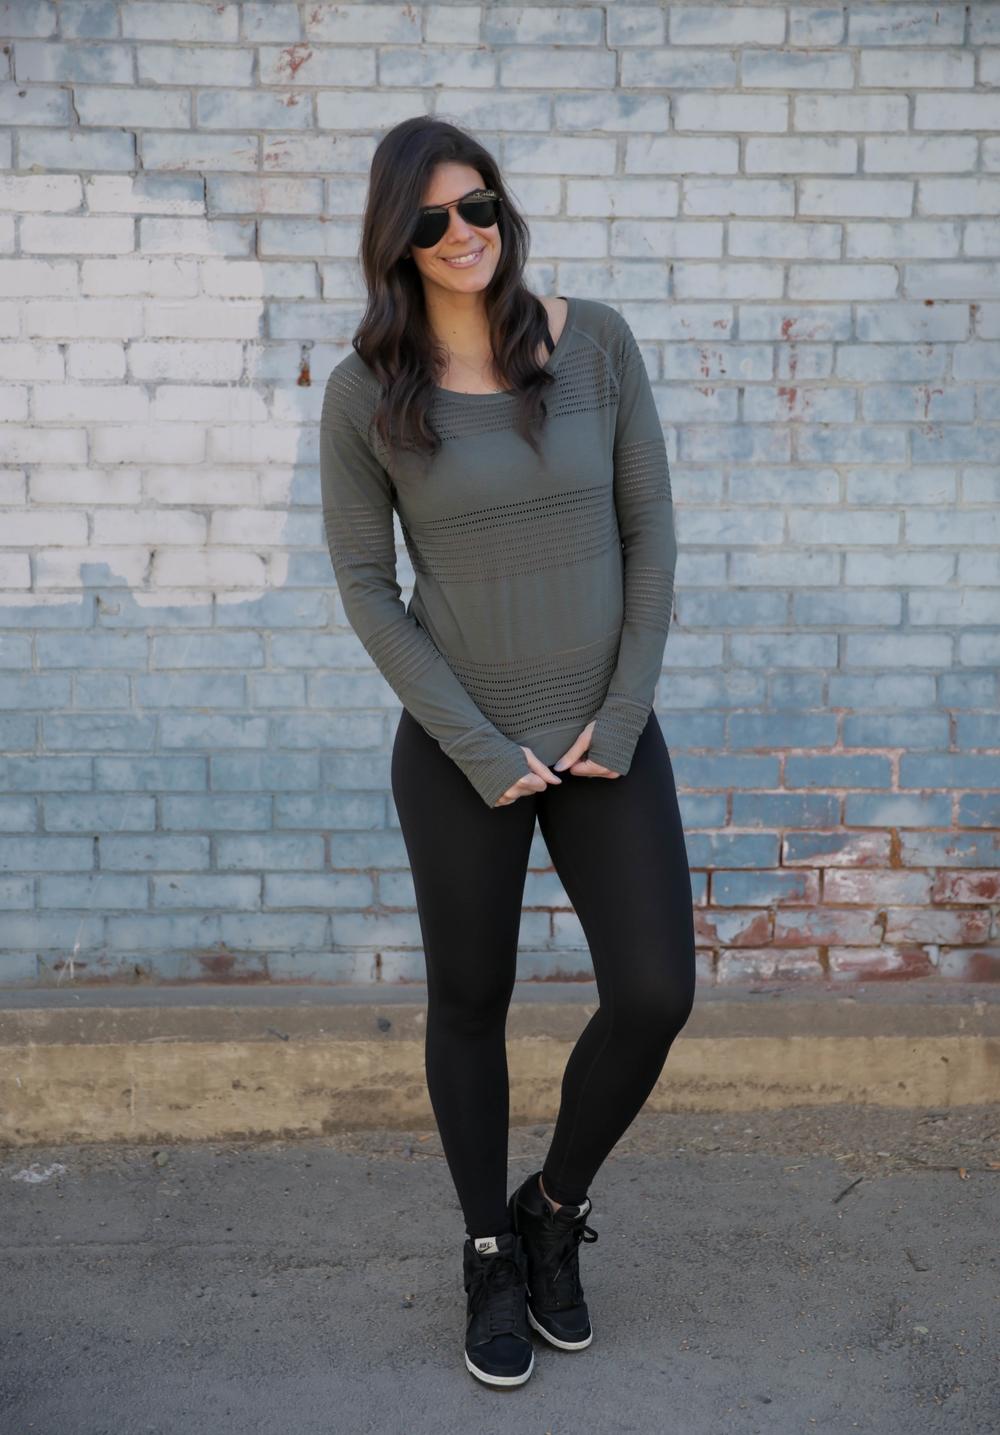 LaurenSchwaiger-Active-Life-Style-Blog-Athleta-Street-Style-OOTD.jpg